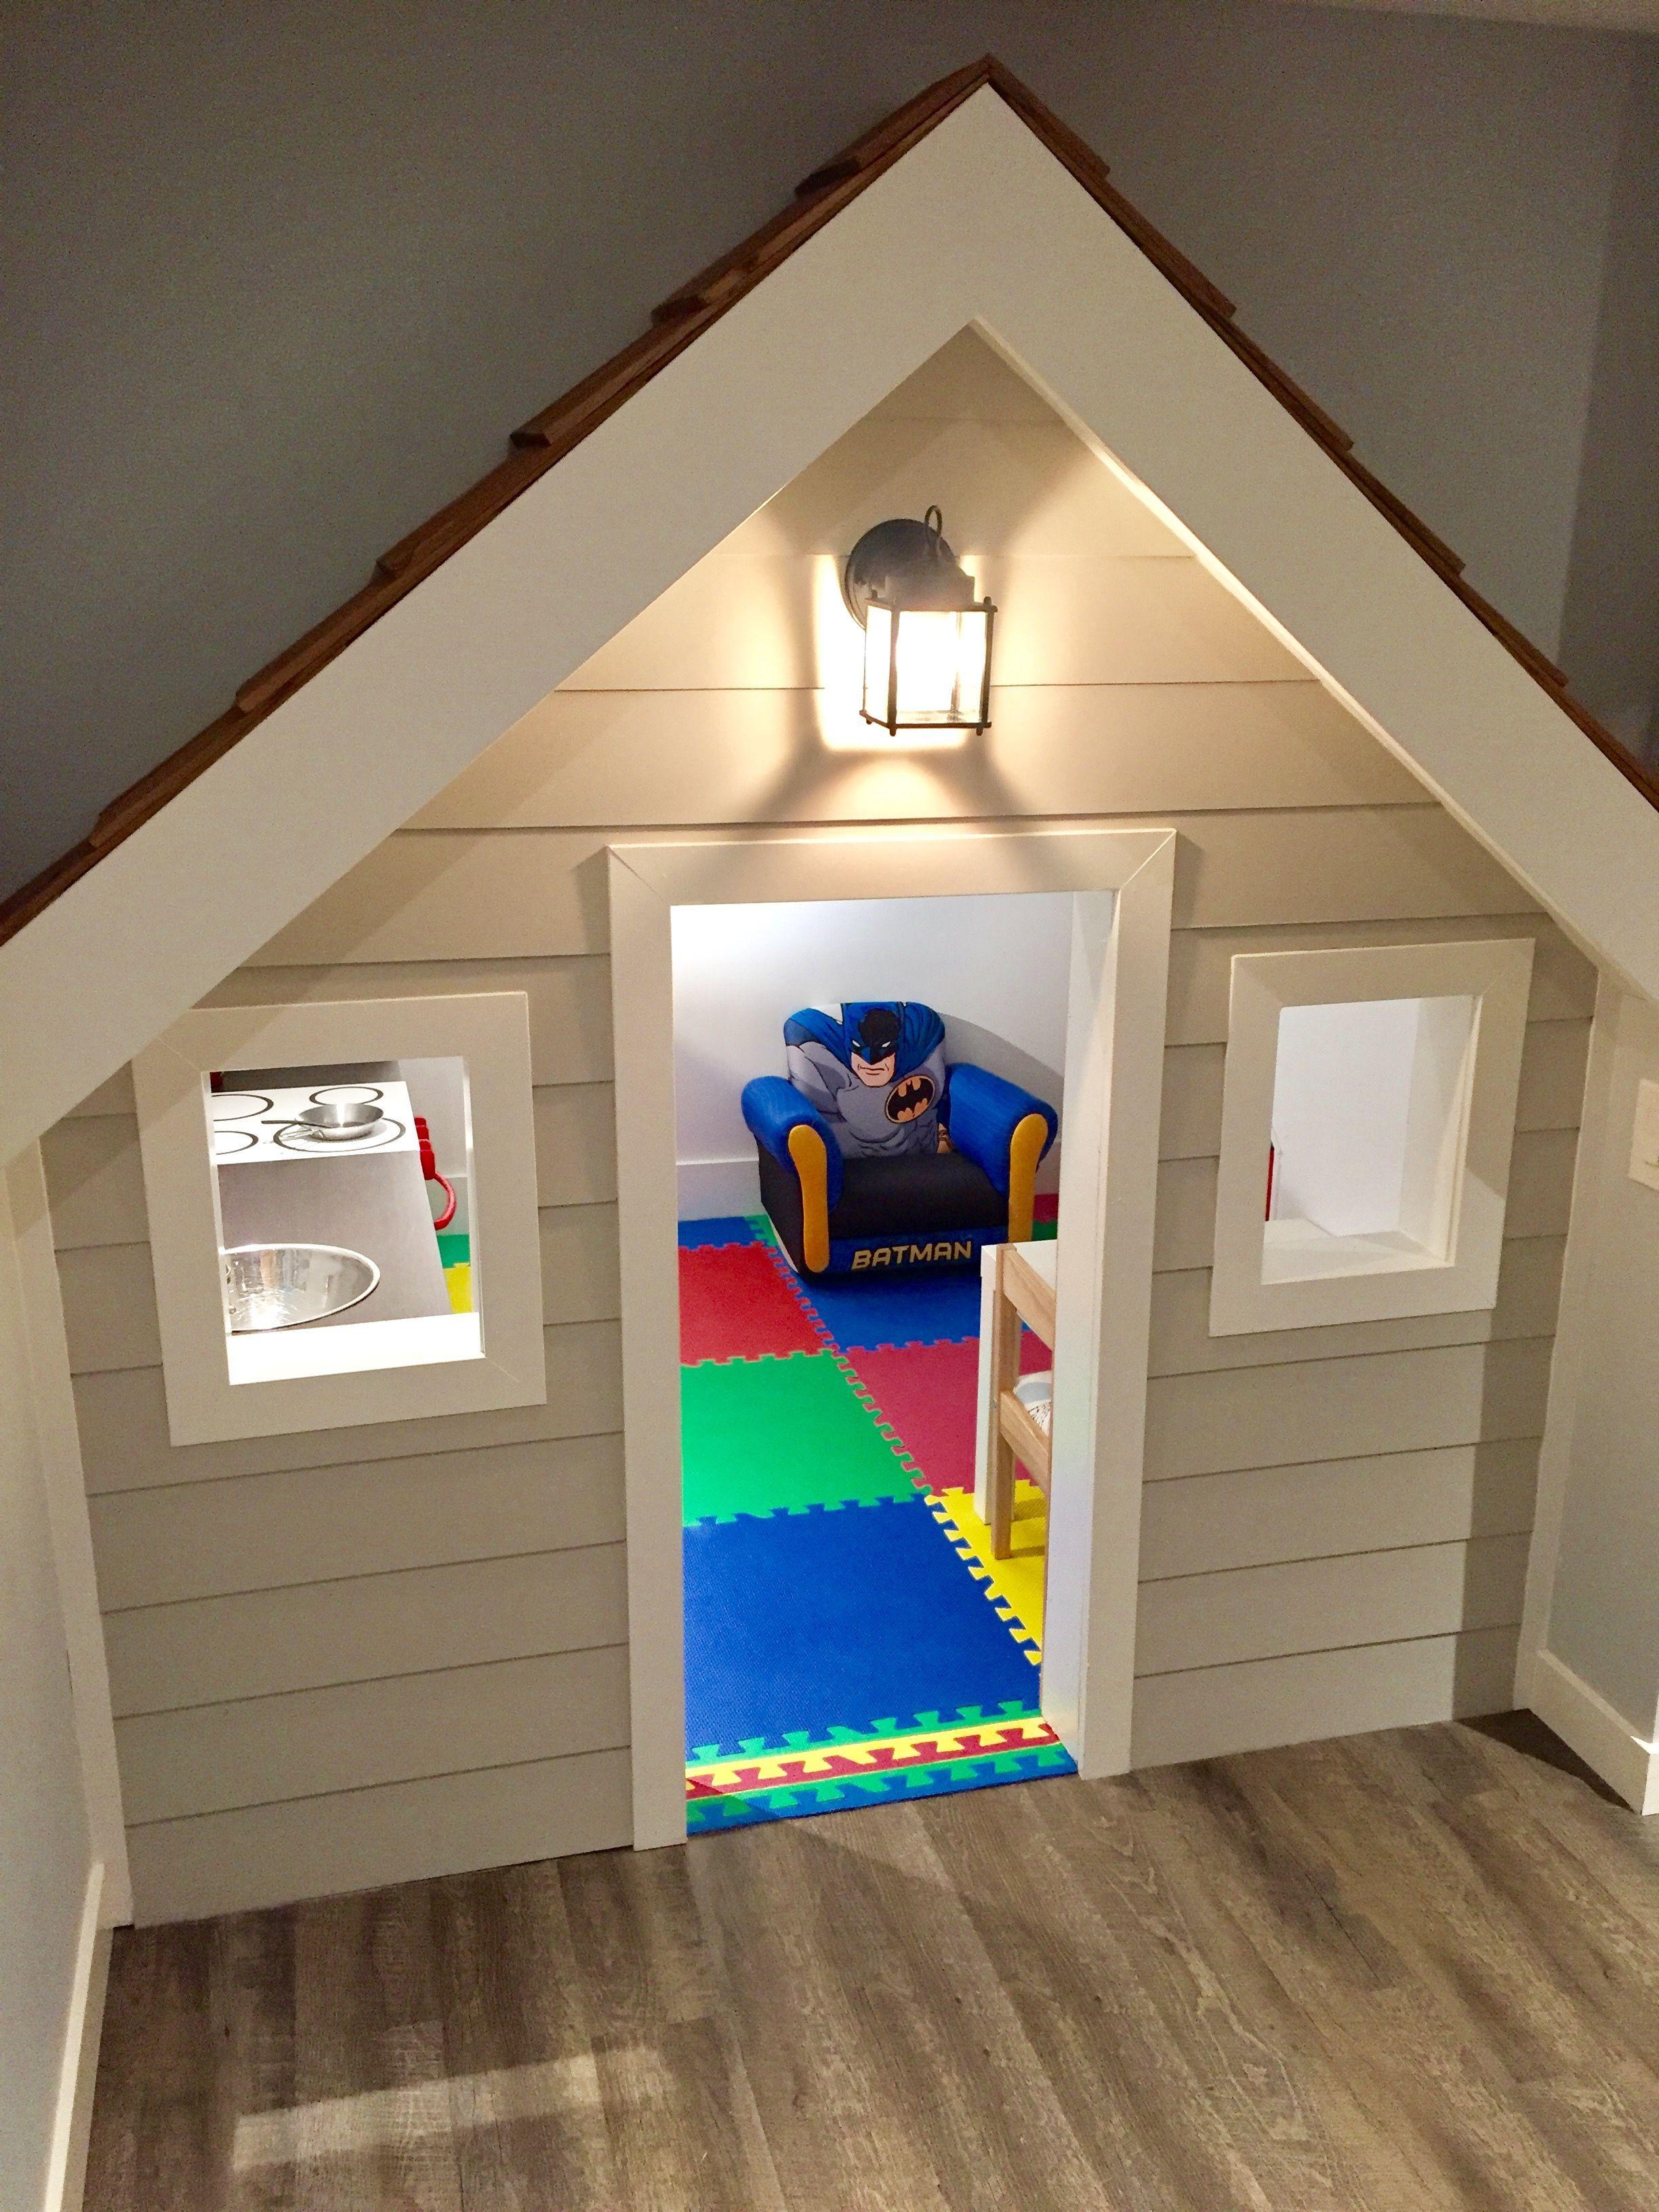 DIY playhouse built under stairs #indoorplayhouse | Inside ...